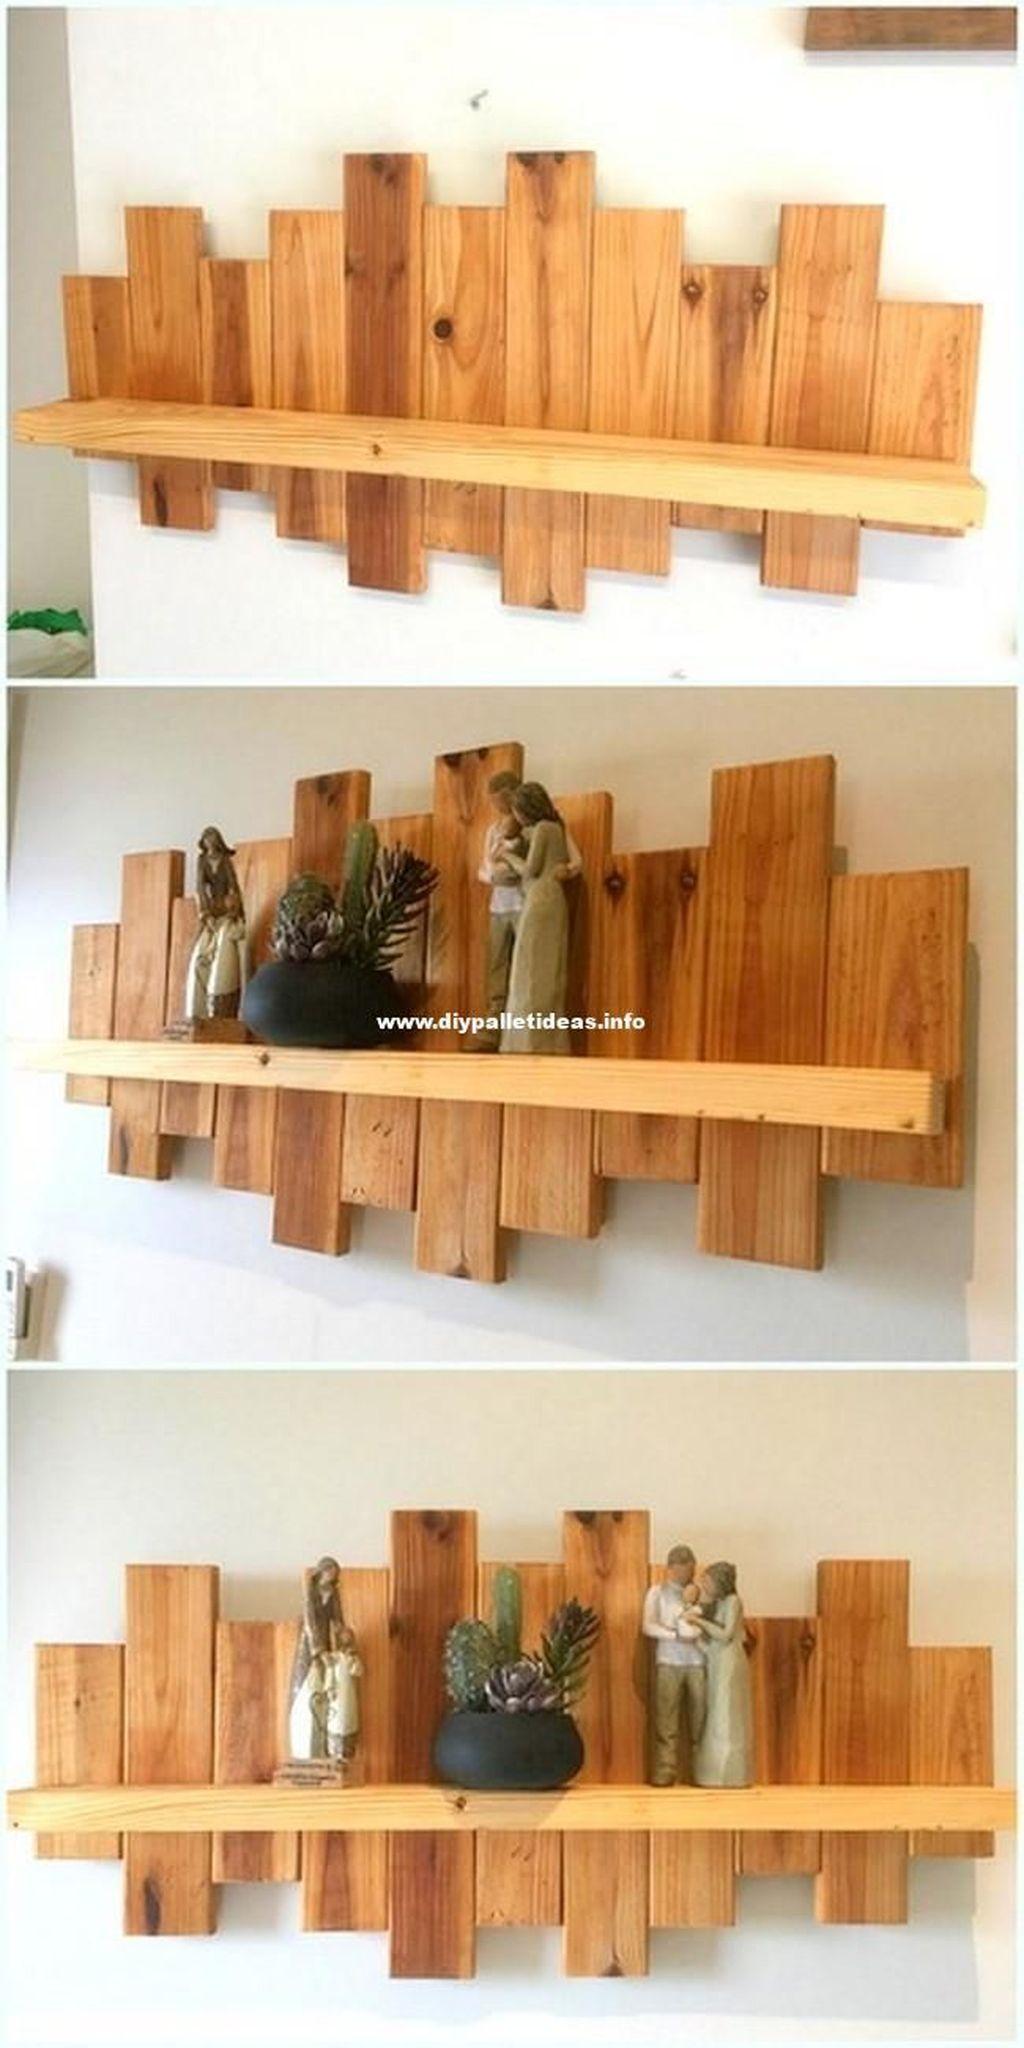 Stunning Diy Pallet Furniture Design Ideas 23 Pallet Furniture